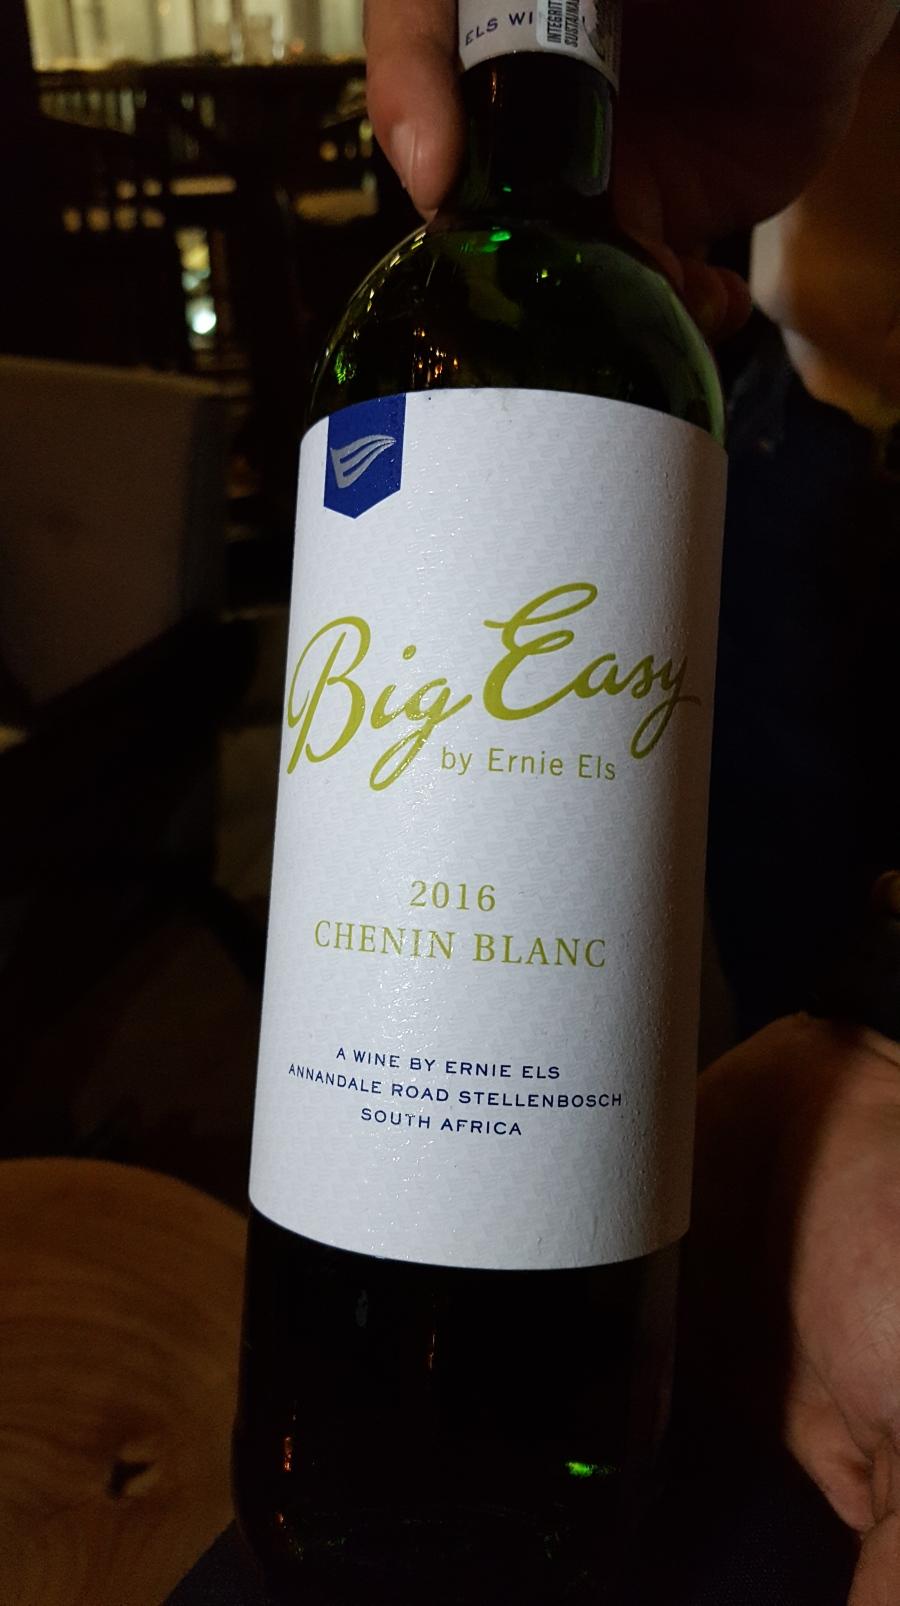 Miami Spice 2017 at Big Easy Wine Bar & Grill at Brickell City Centre